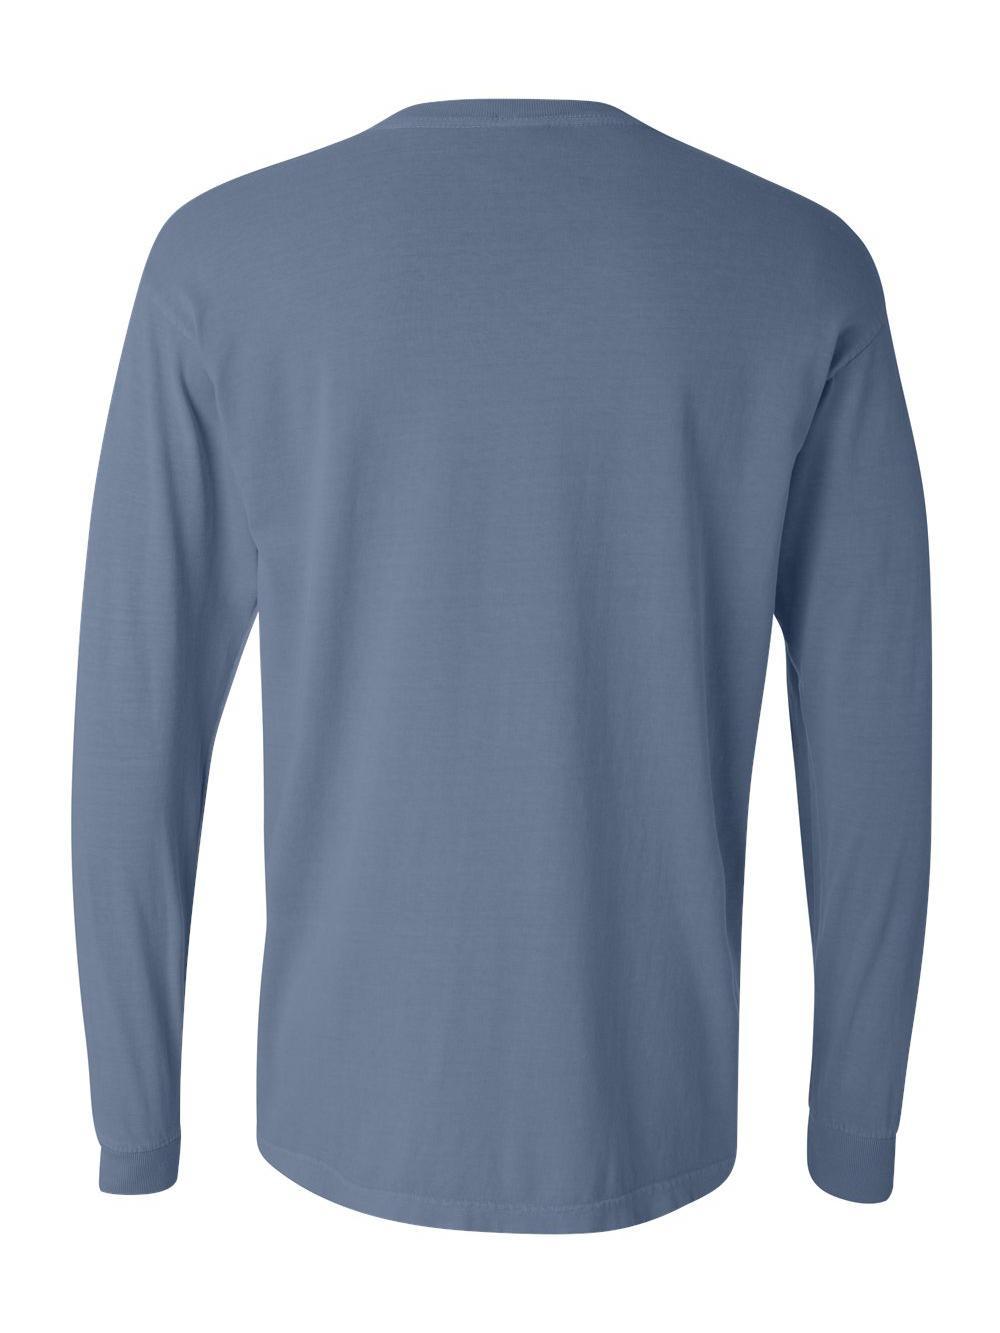 Comfort-Colors-Garment-Dyed-Heavyweight-Ringspun-Long-Sleeve-T-Shirt-6014 thumbnail 13